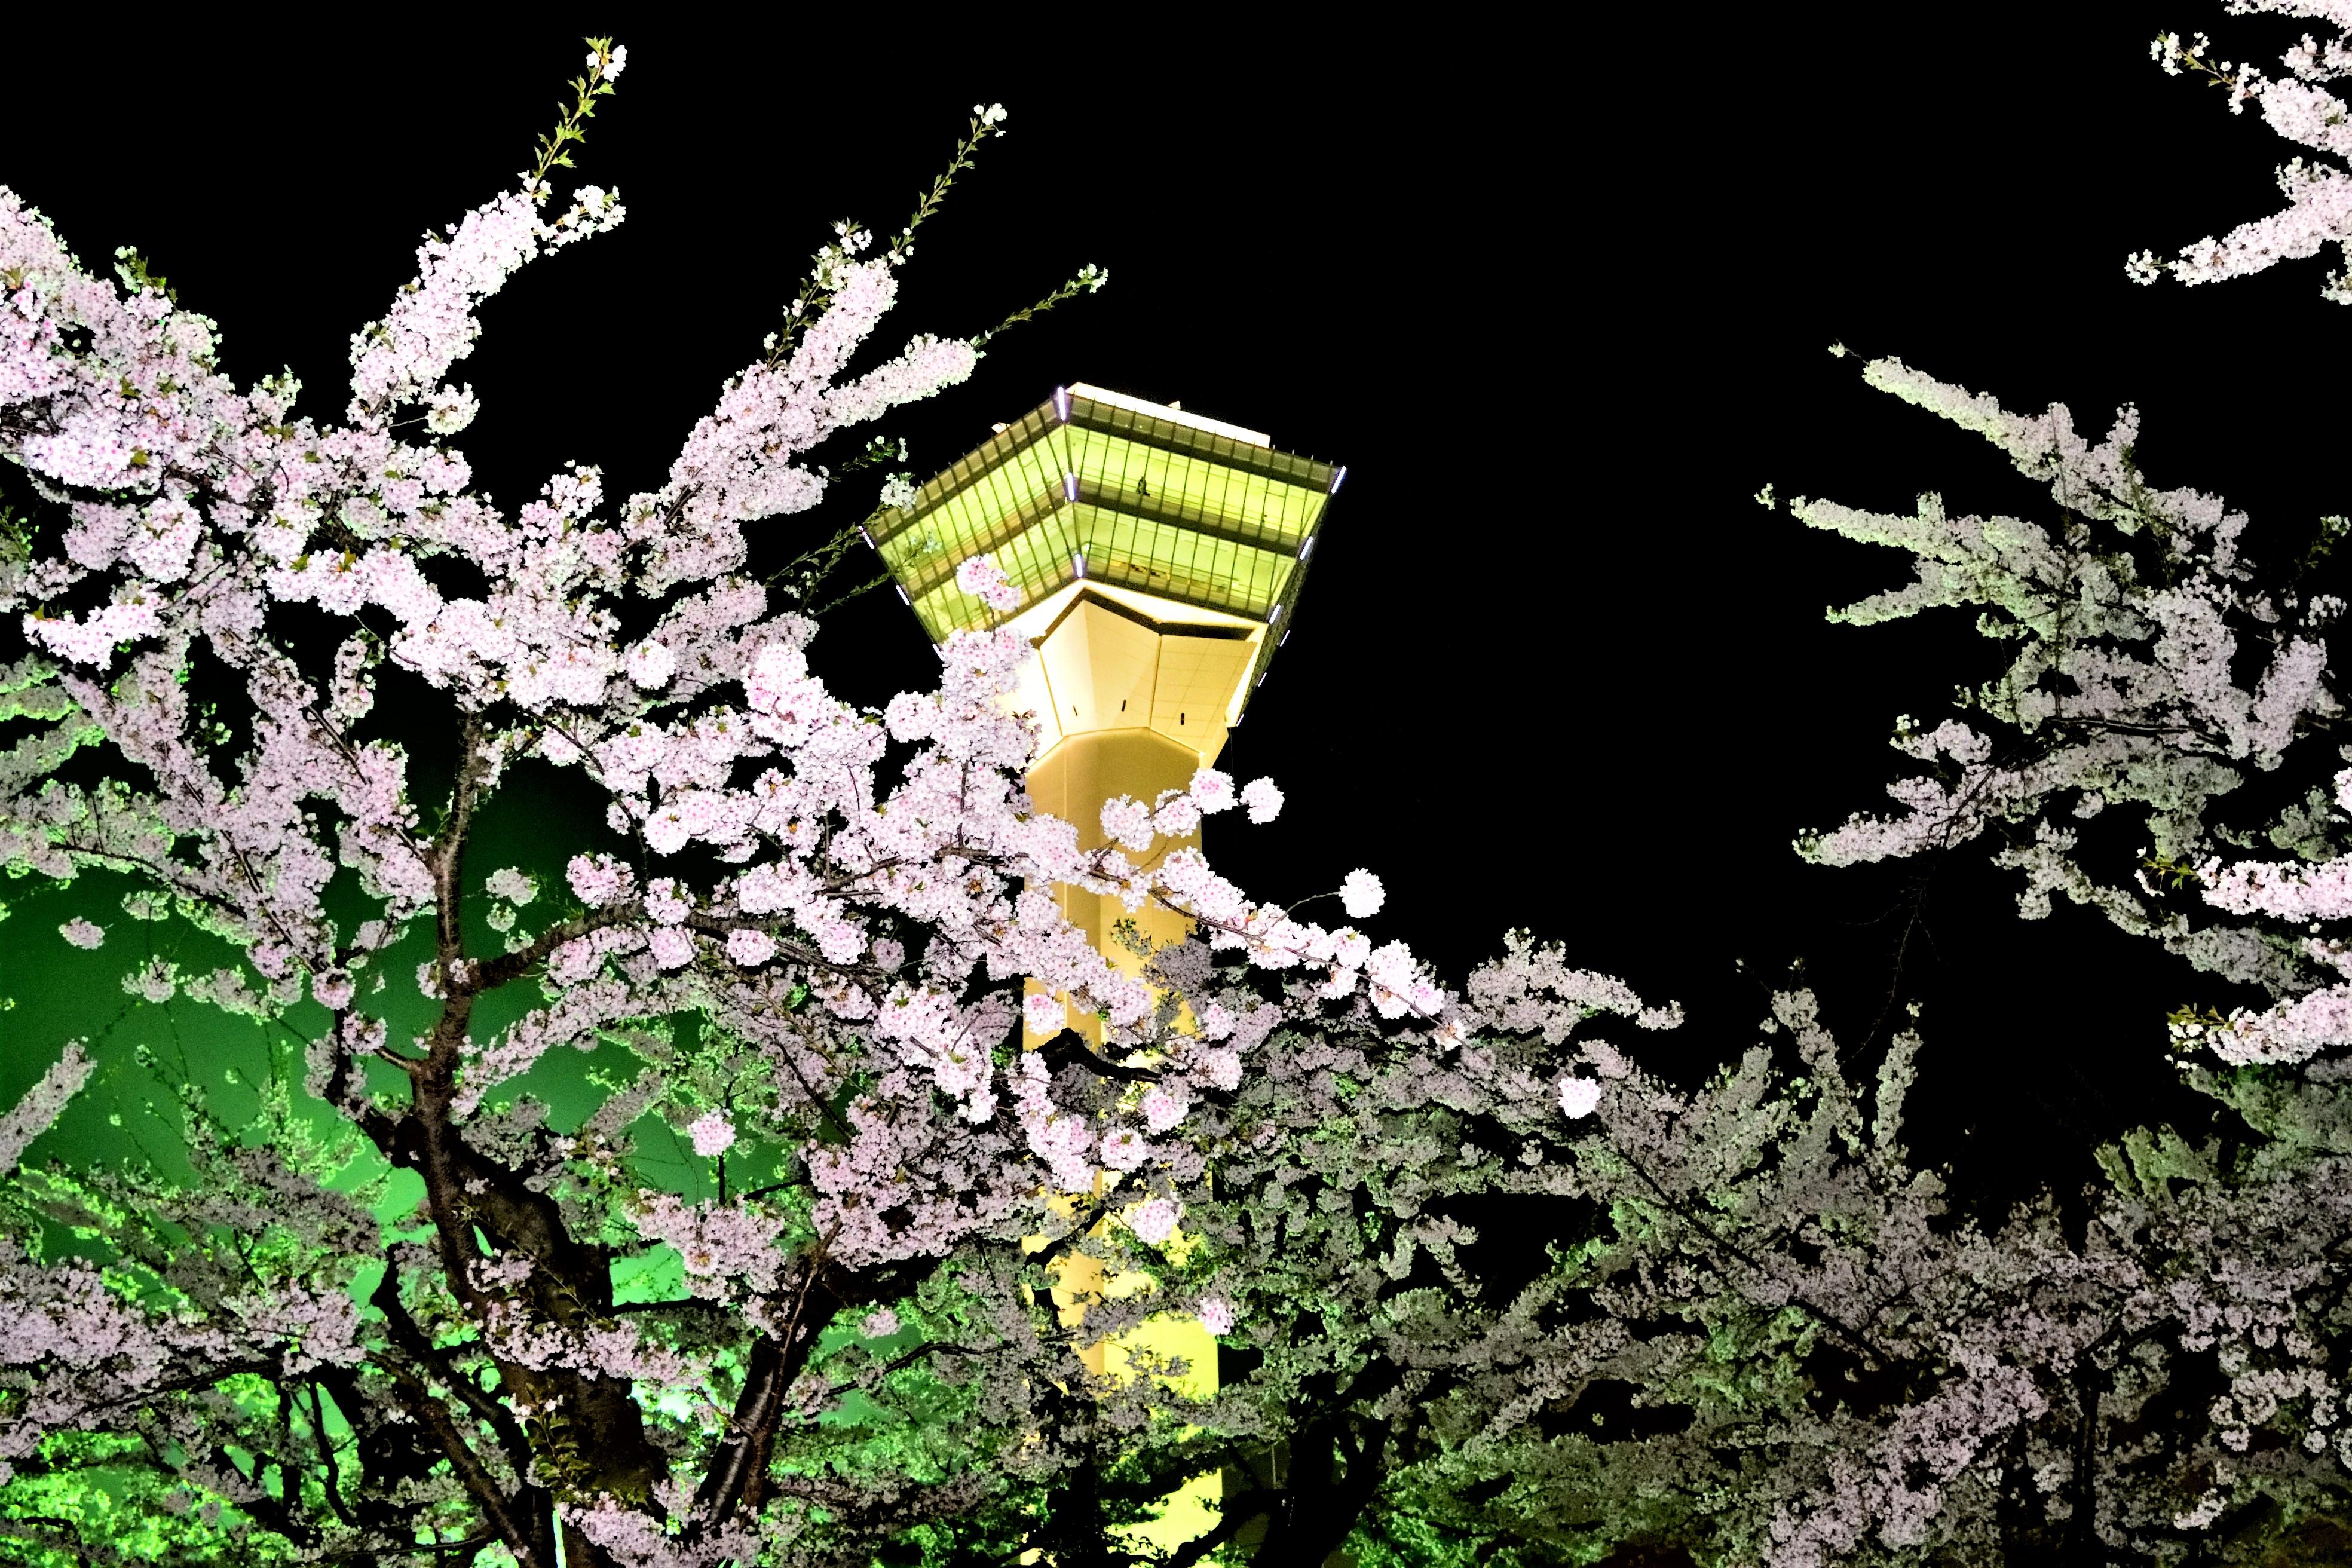 Goryokaku tower and cherry trees lighted up